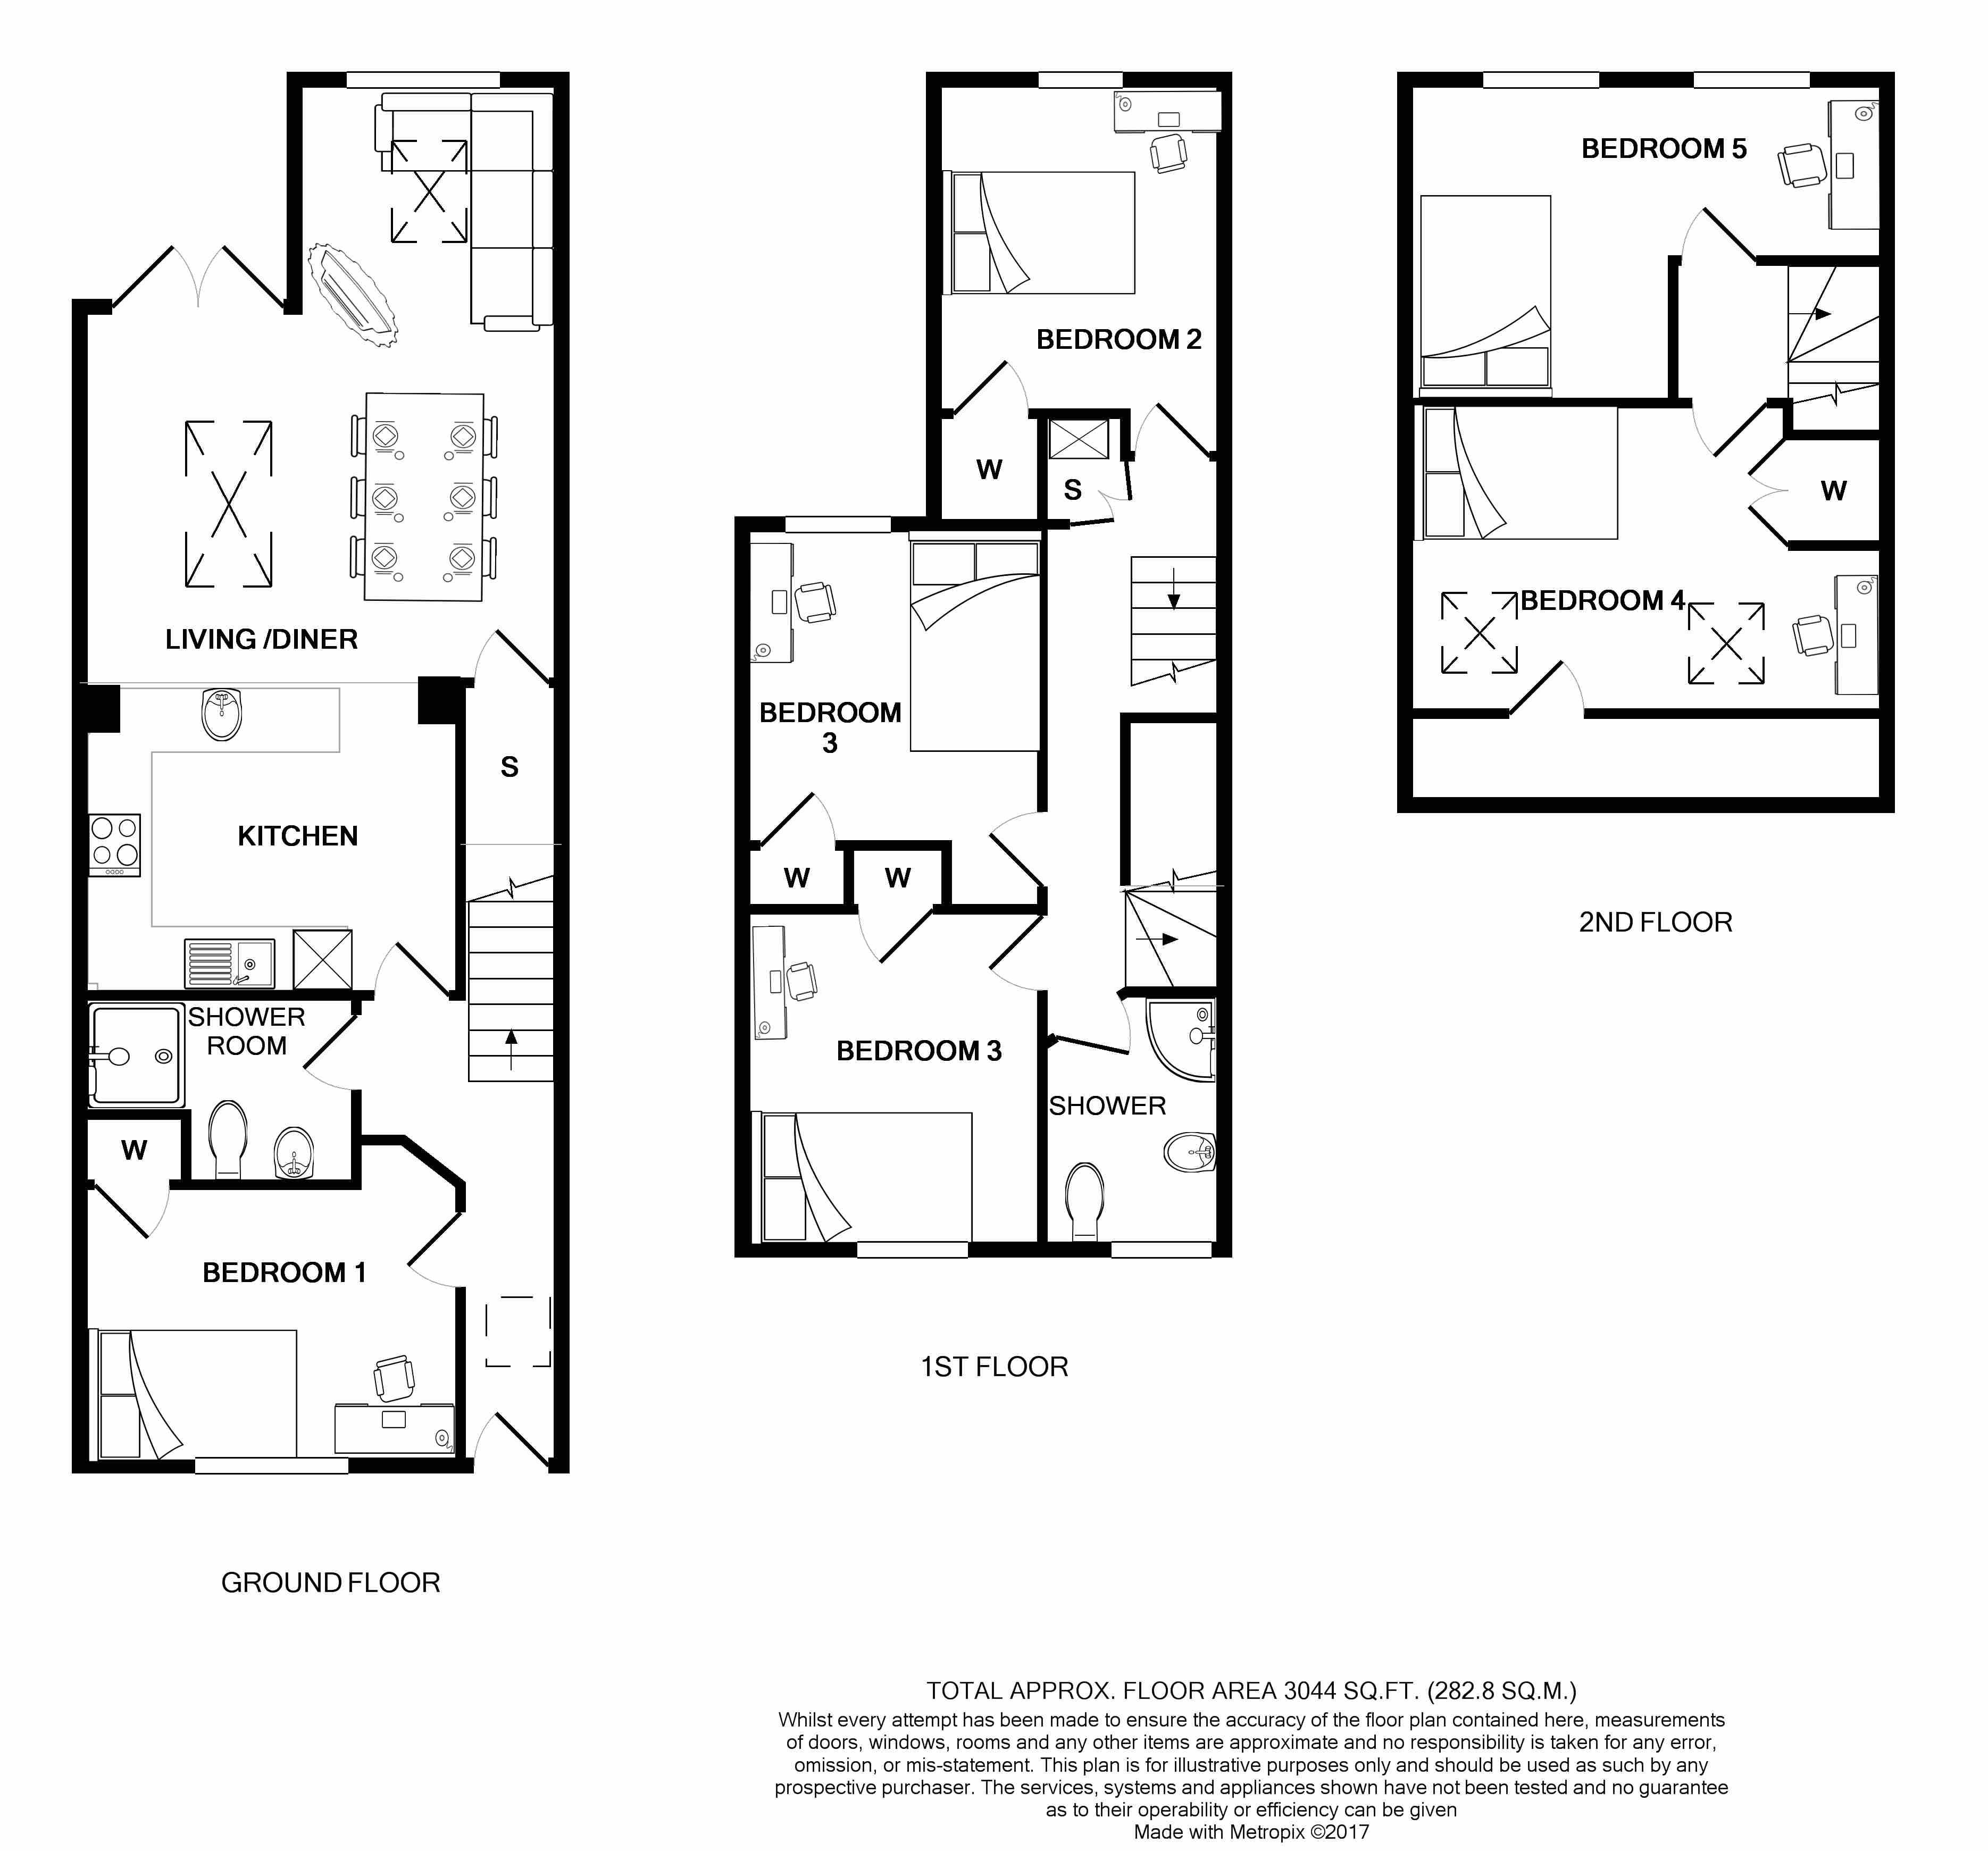 19 Cranbrook Street Floorplans